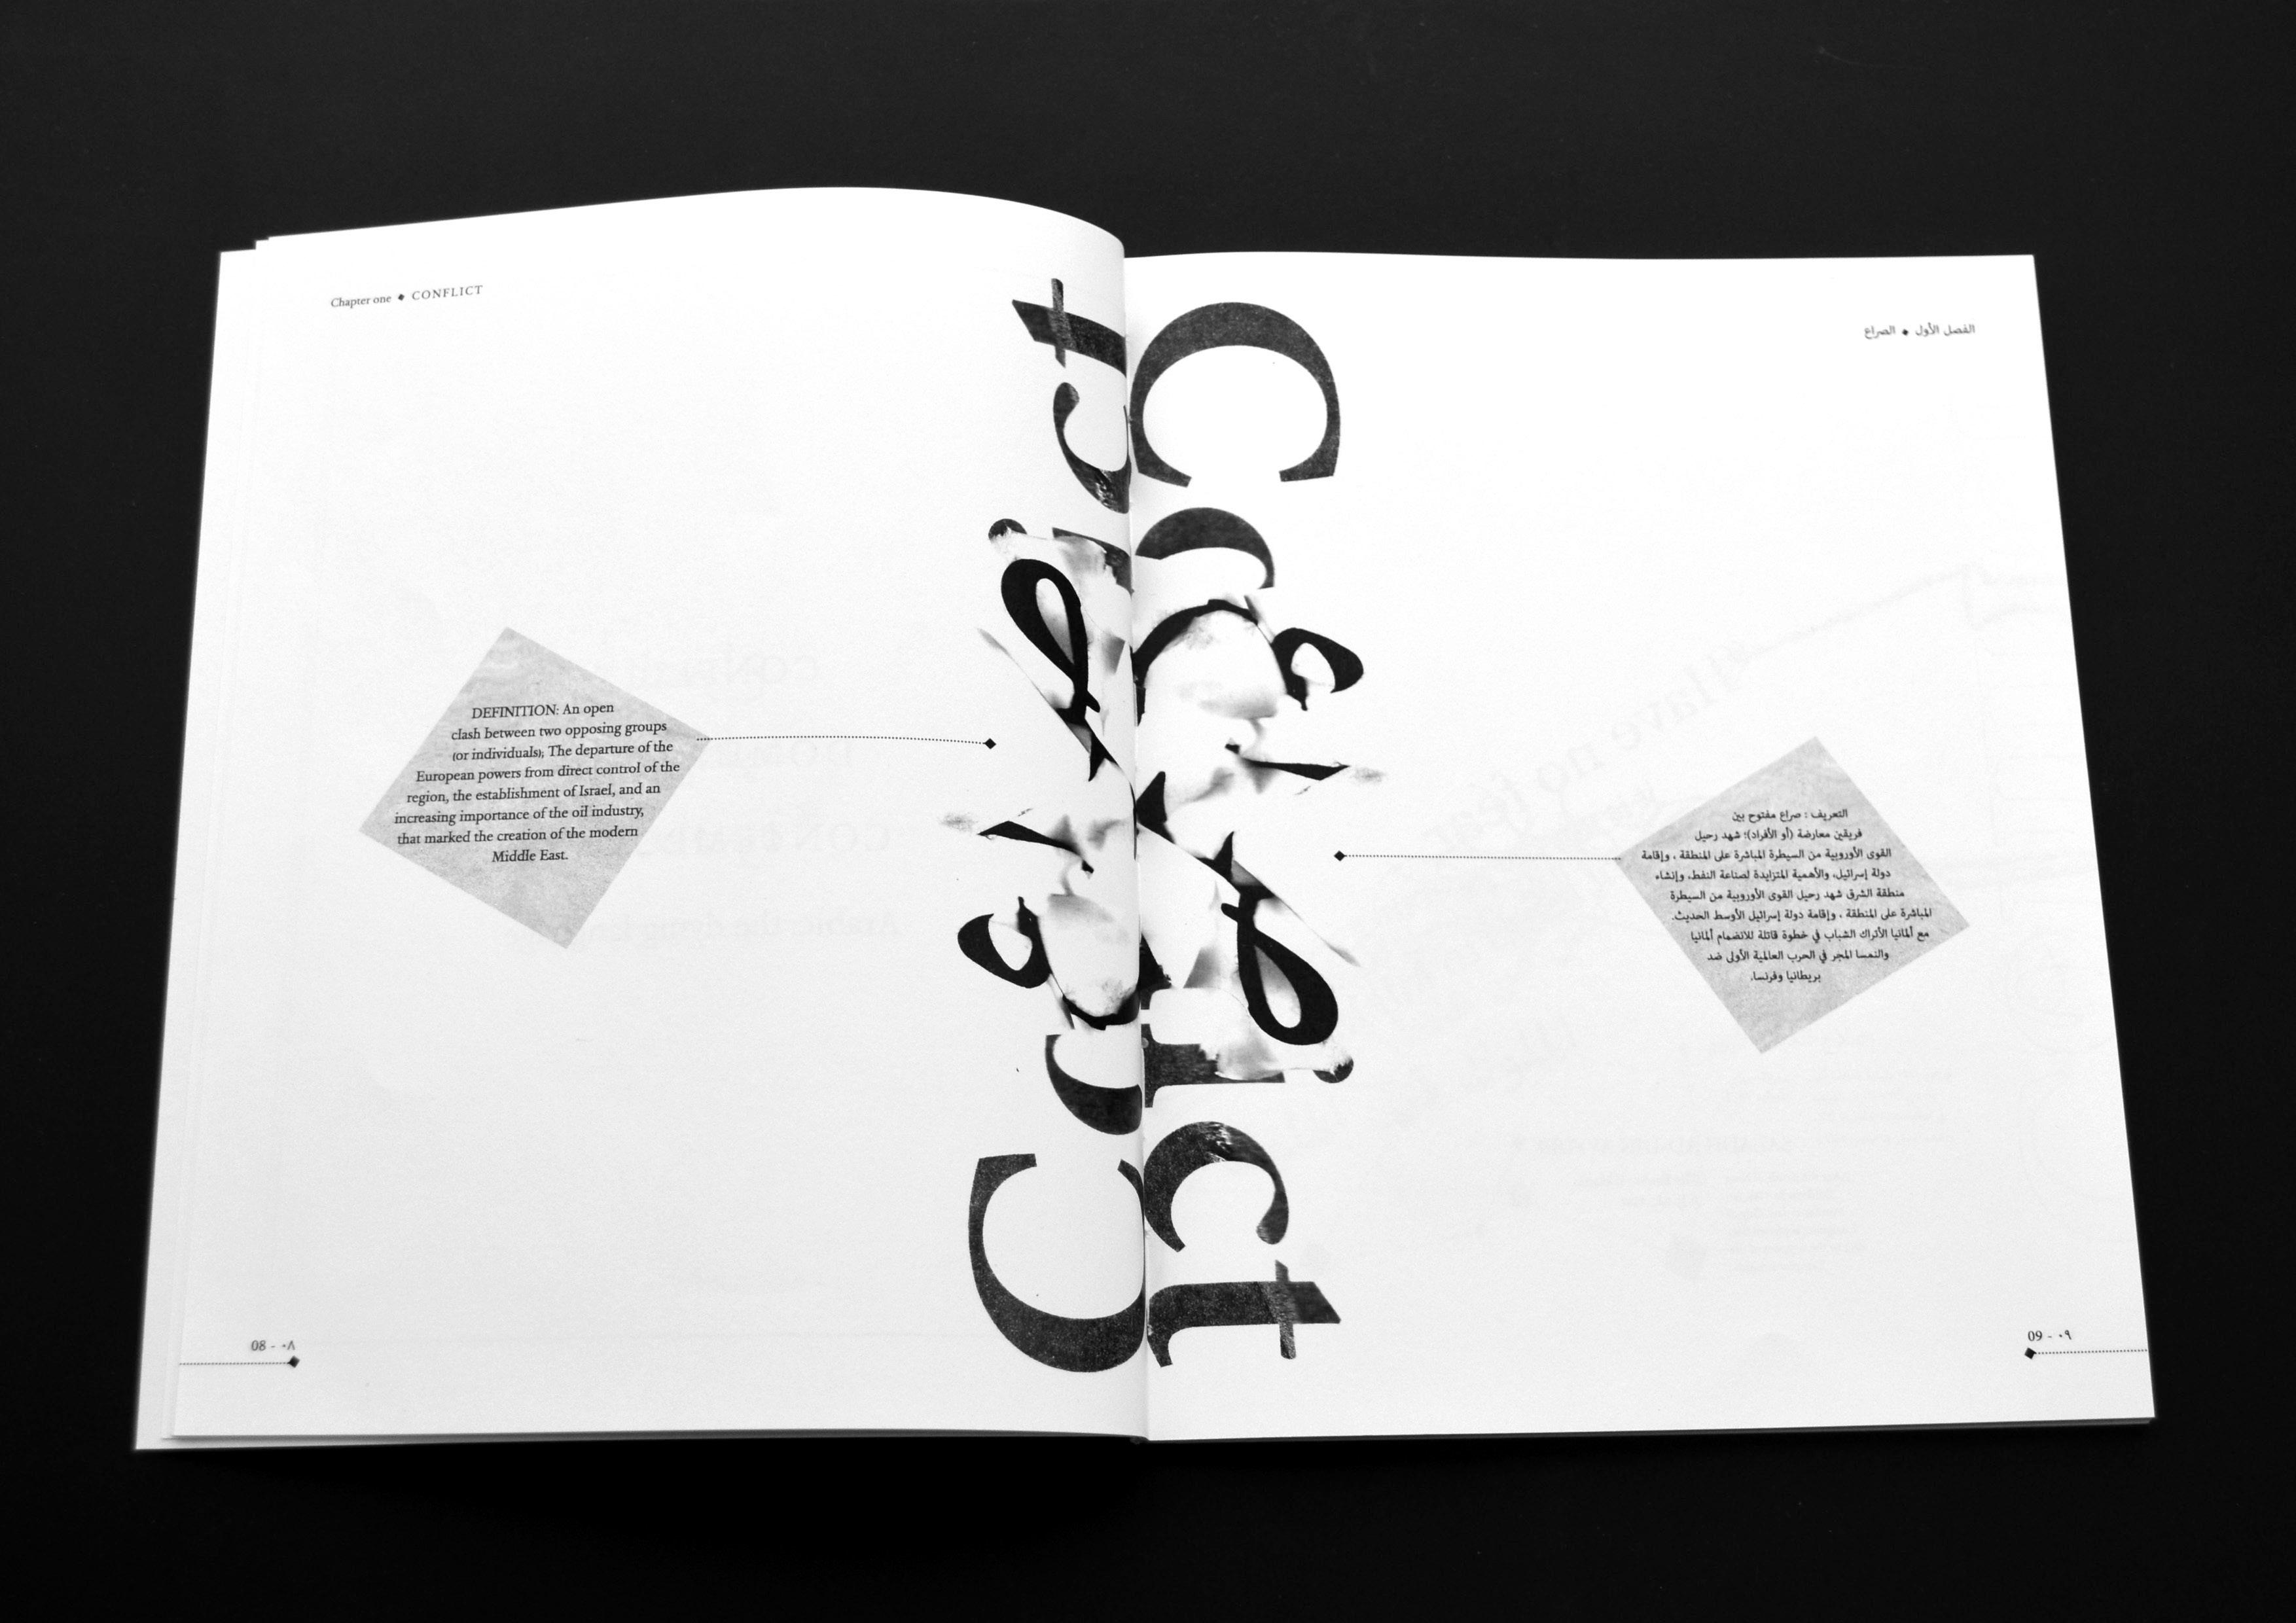 What does zena mean in arabic